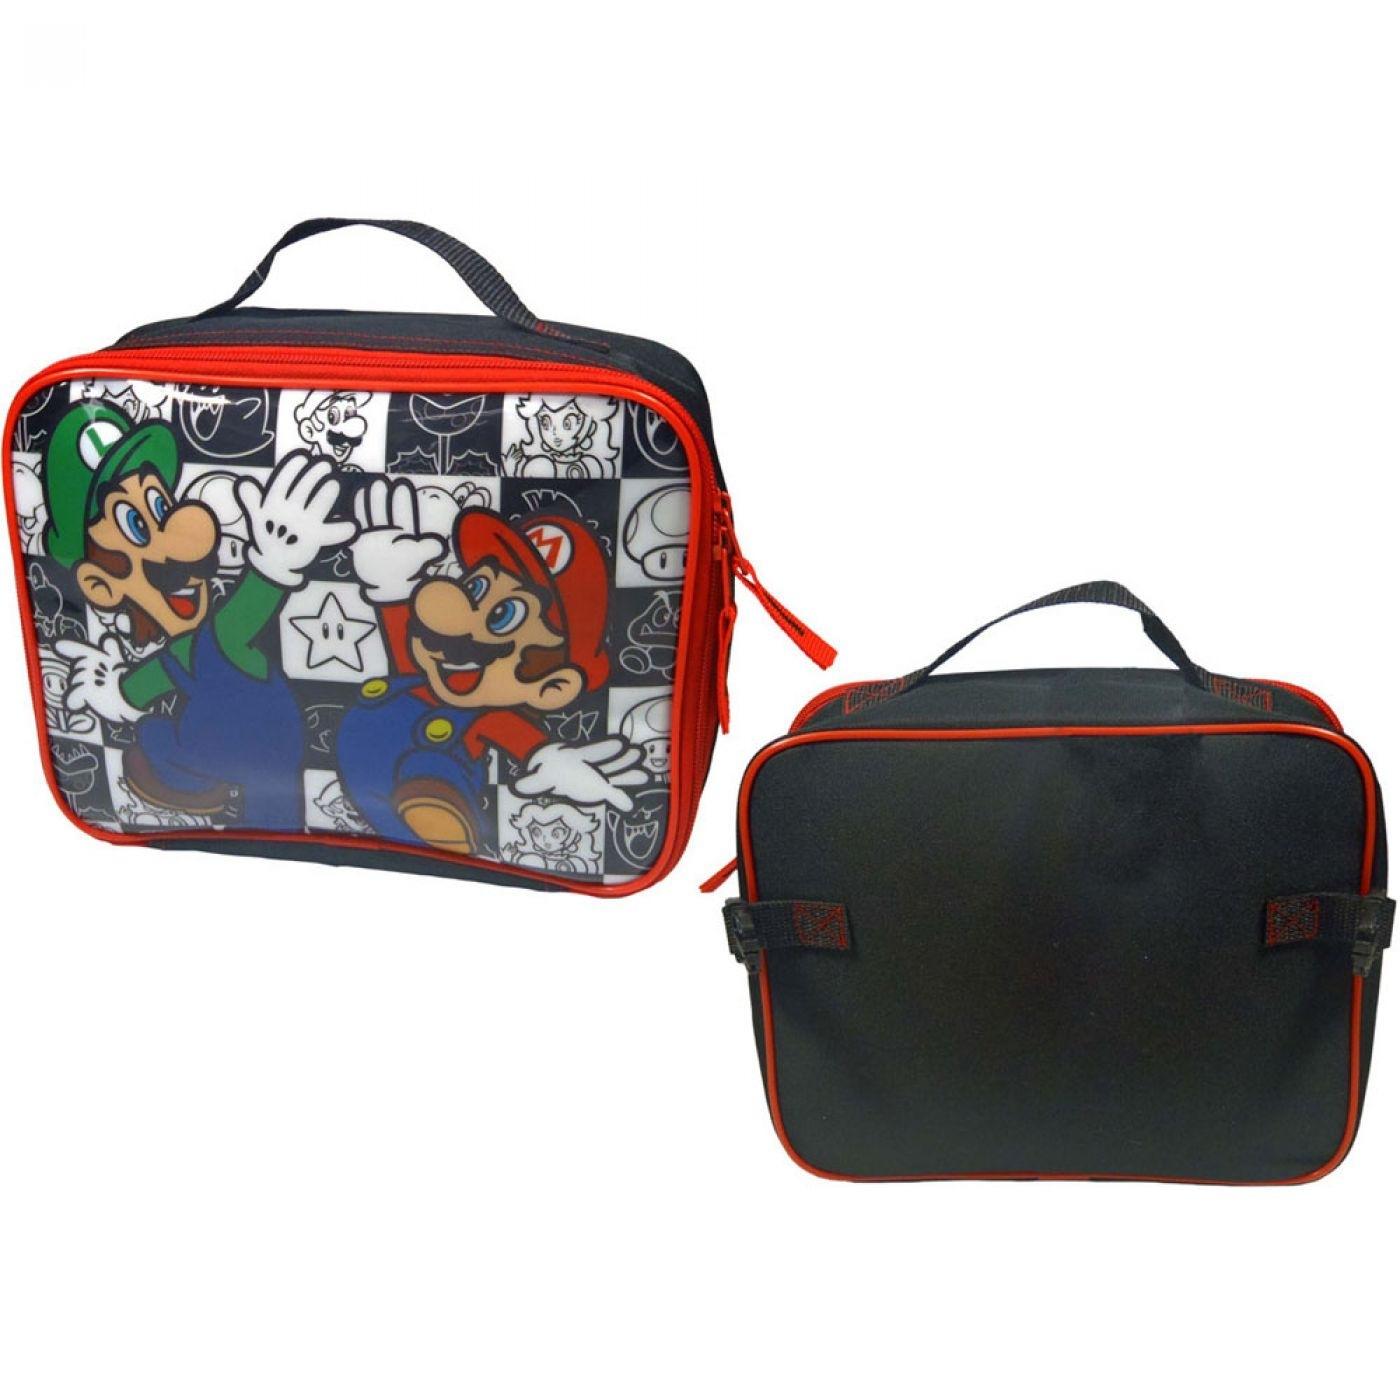 Nintendo Super Mario Bros lunch bag - Mario/Luigi bag